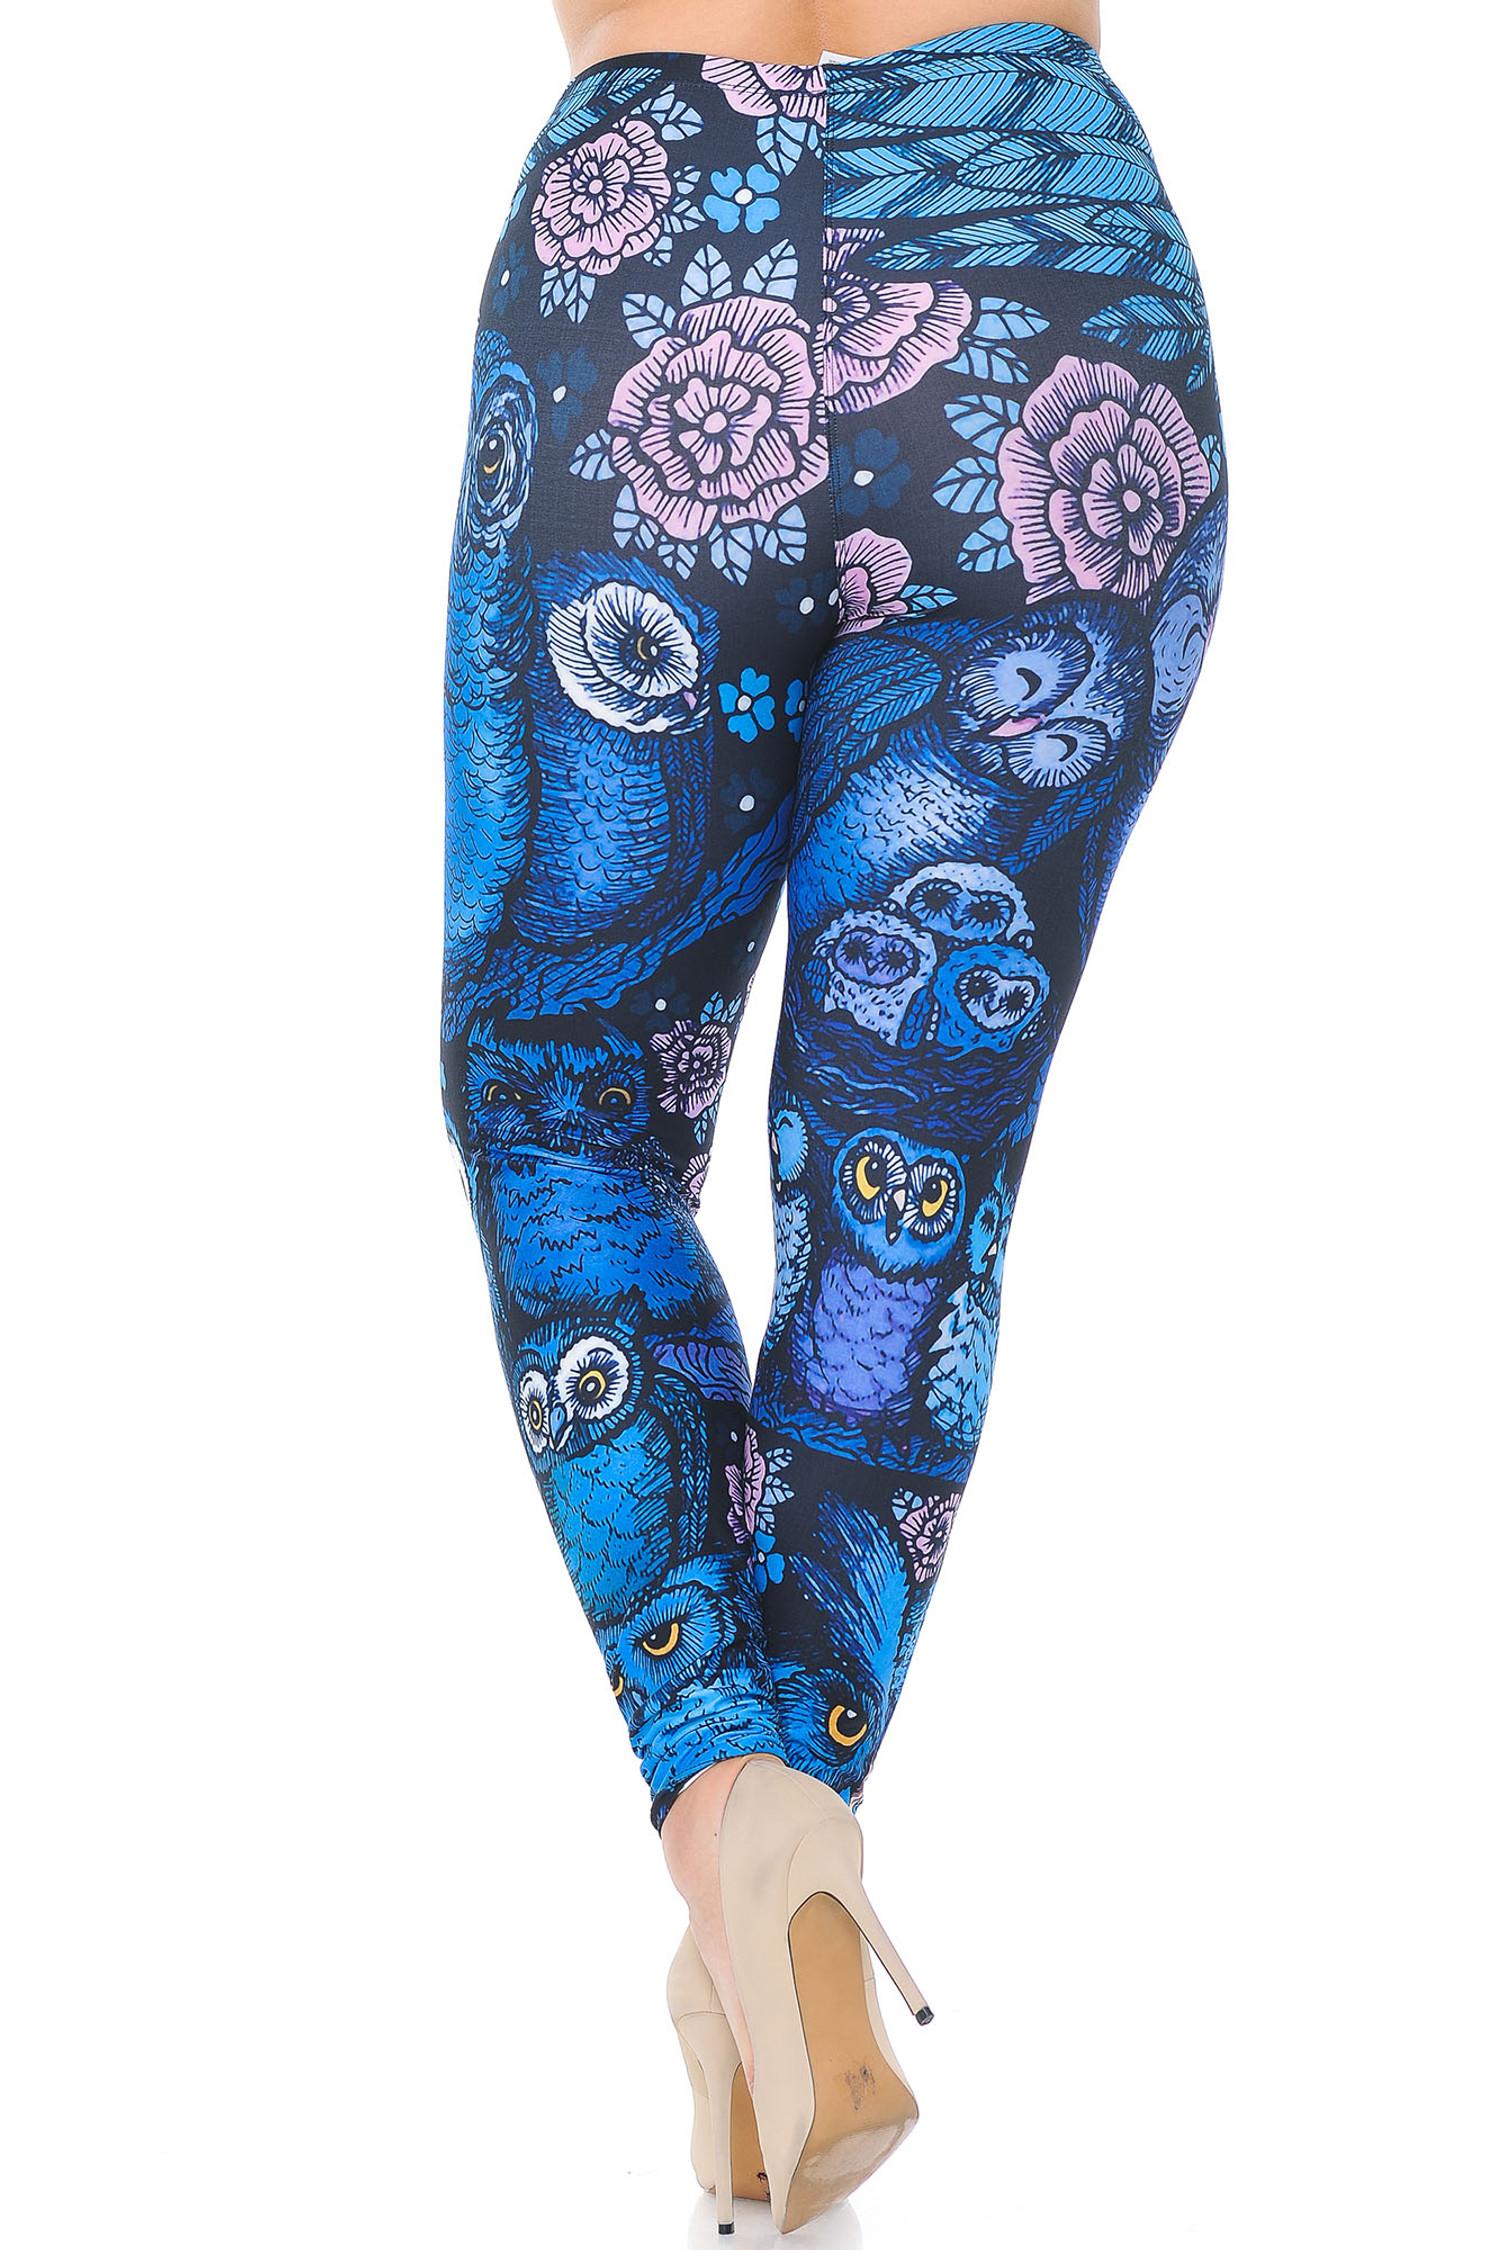 Creamy Soft Blue Owl Collage Extra Plus Size Leggings - 3X-5X - USA Fashion™